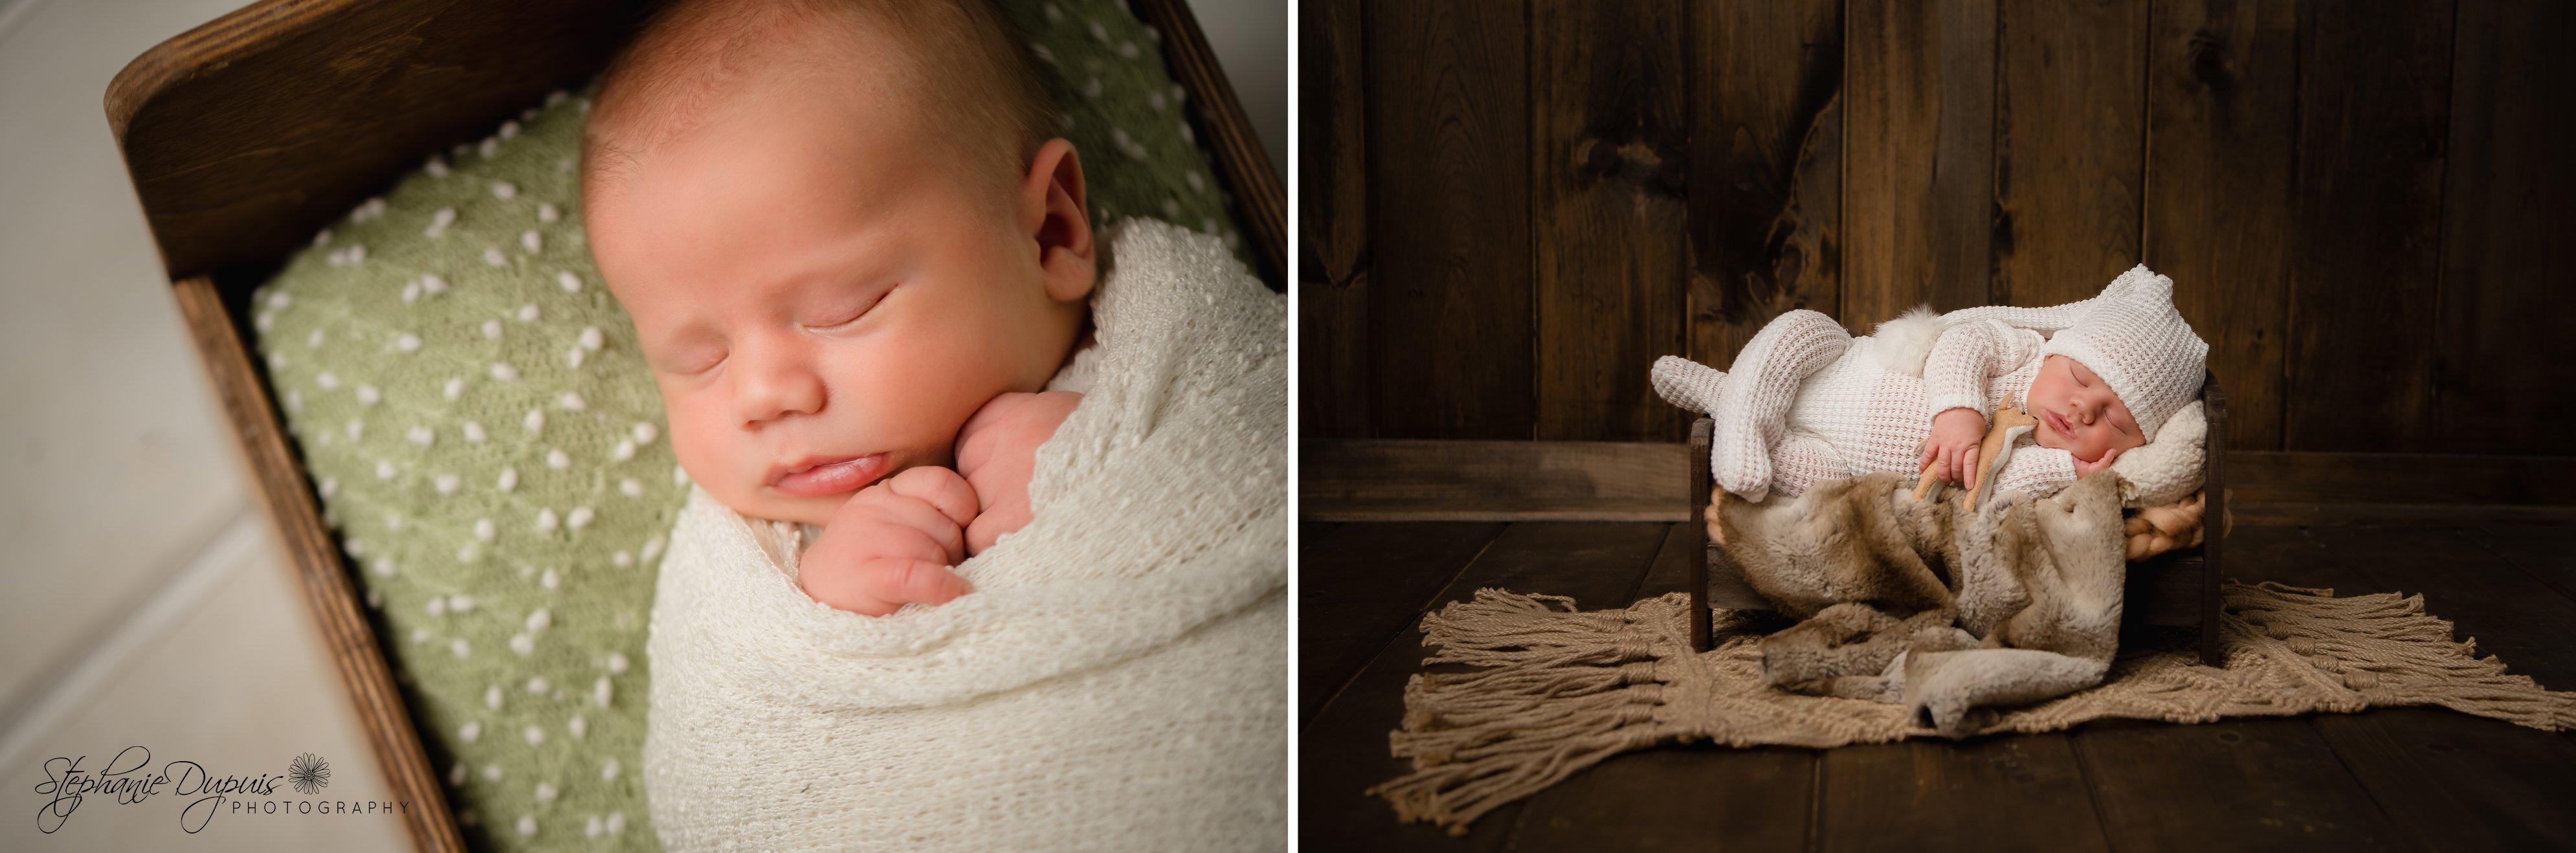 Decota infant 3 - Portfolio: Bohdon Newborn Session